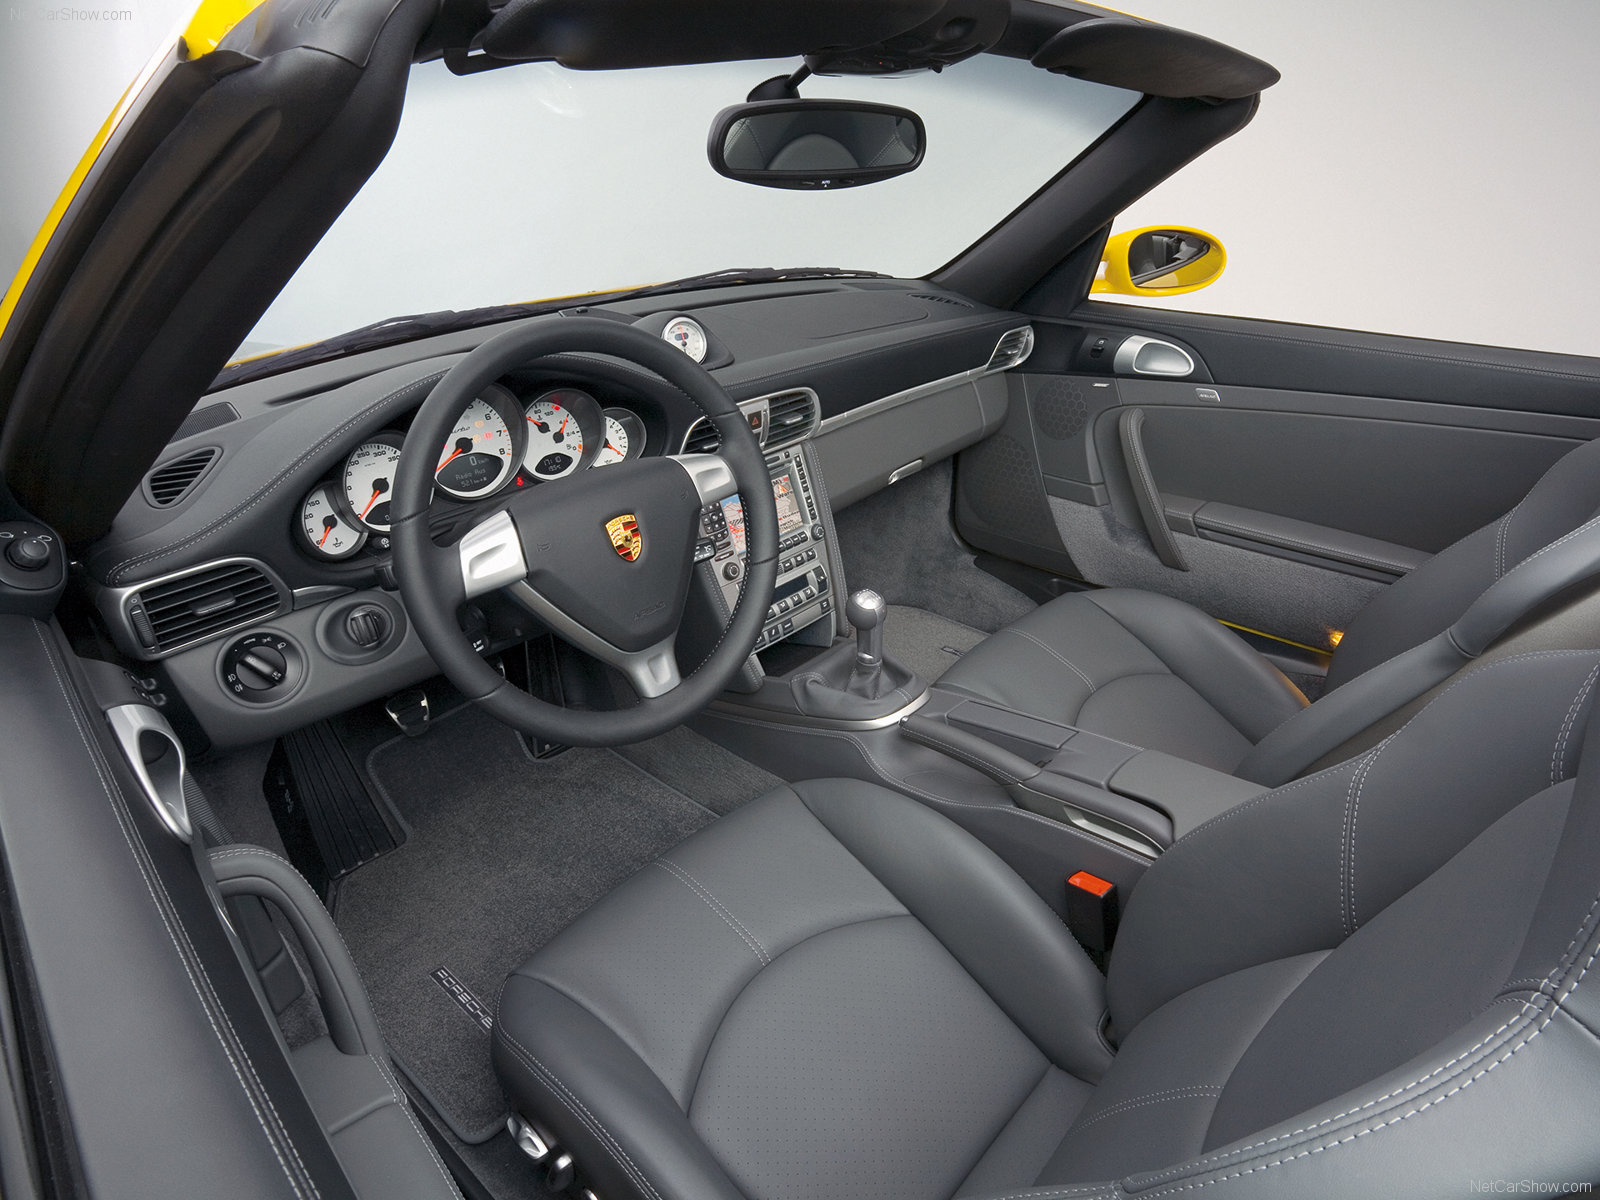 Porsche 911 VI (997) 2004 - 2008 Cabriolet #4